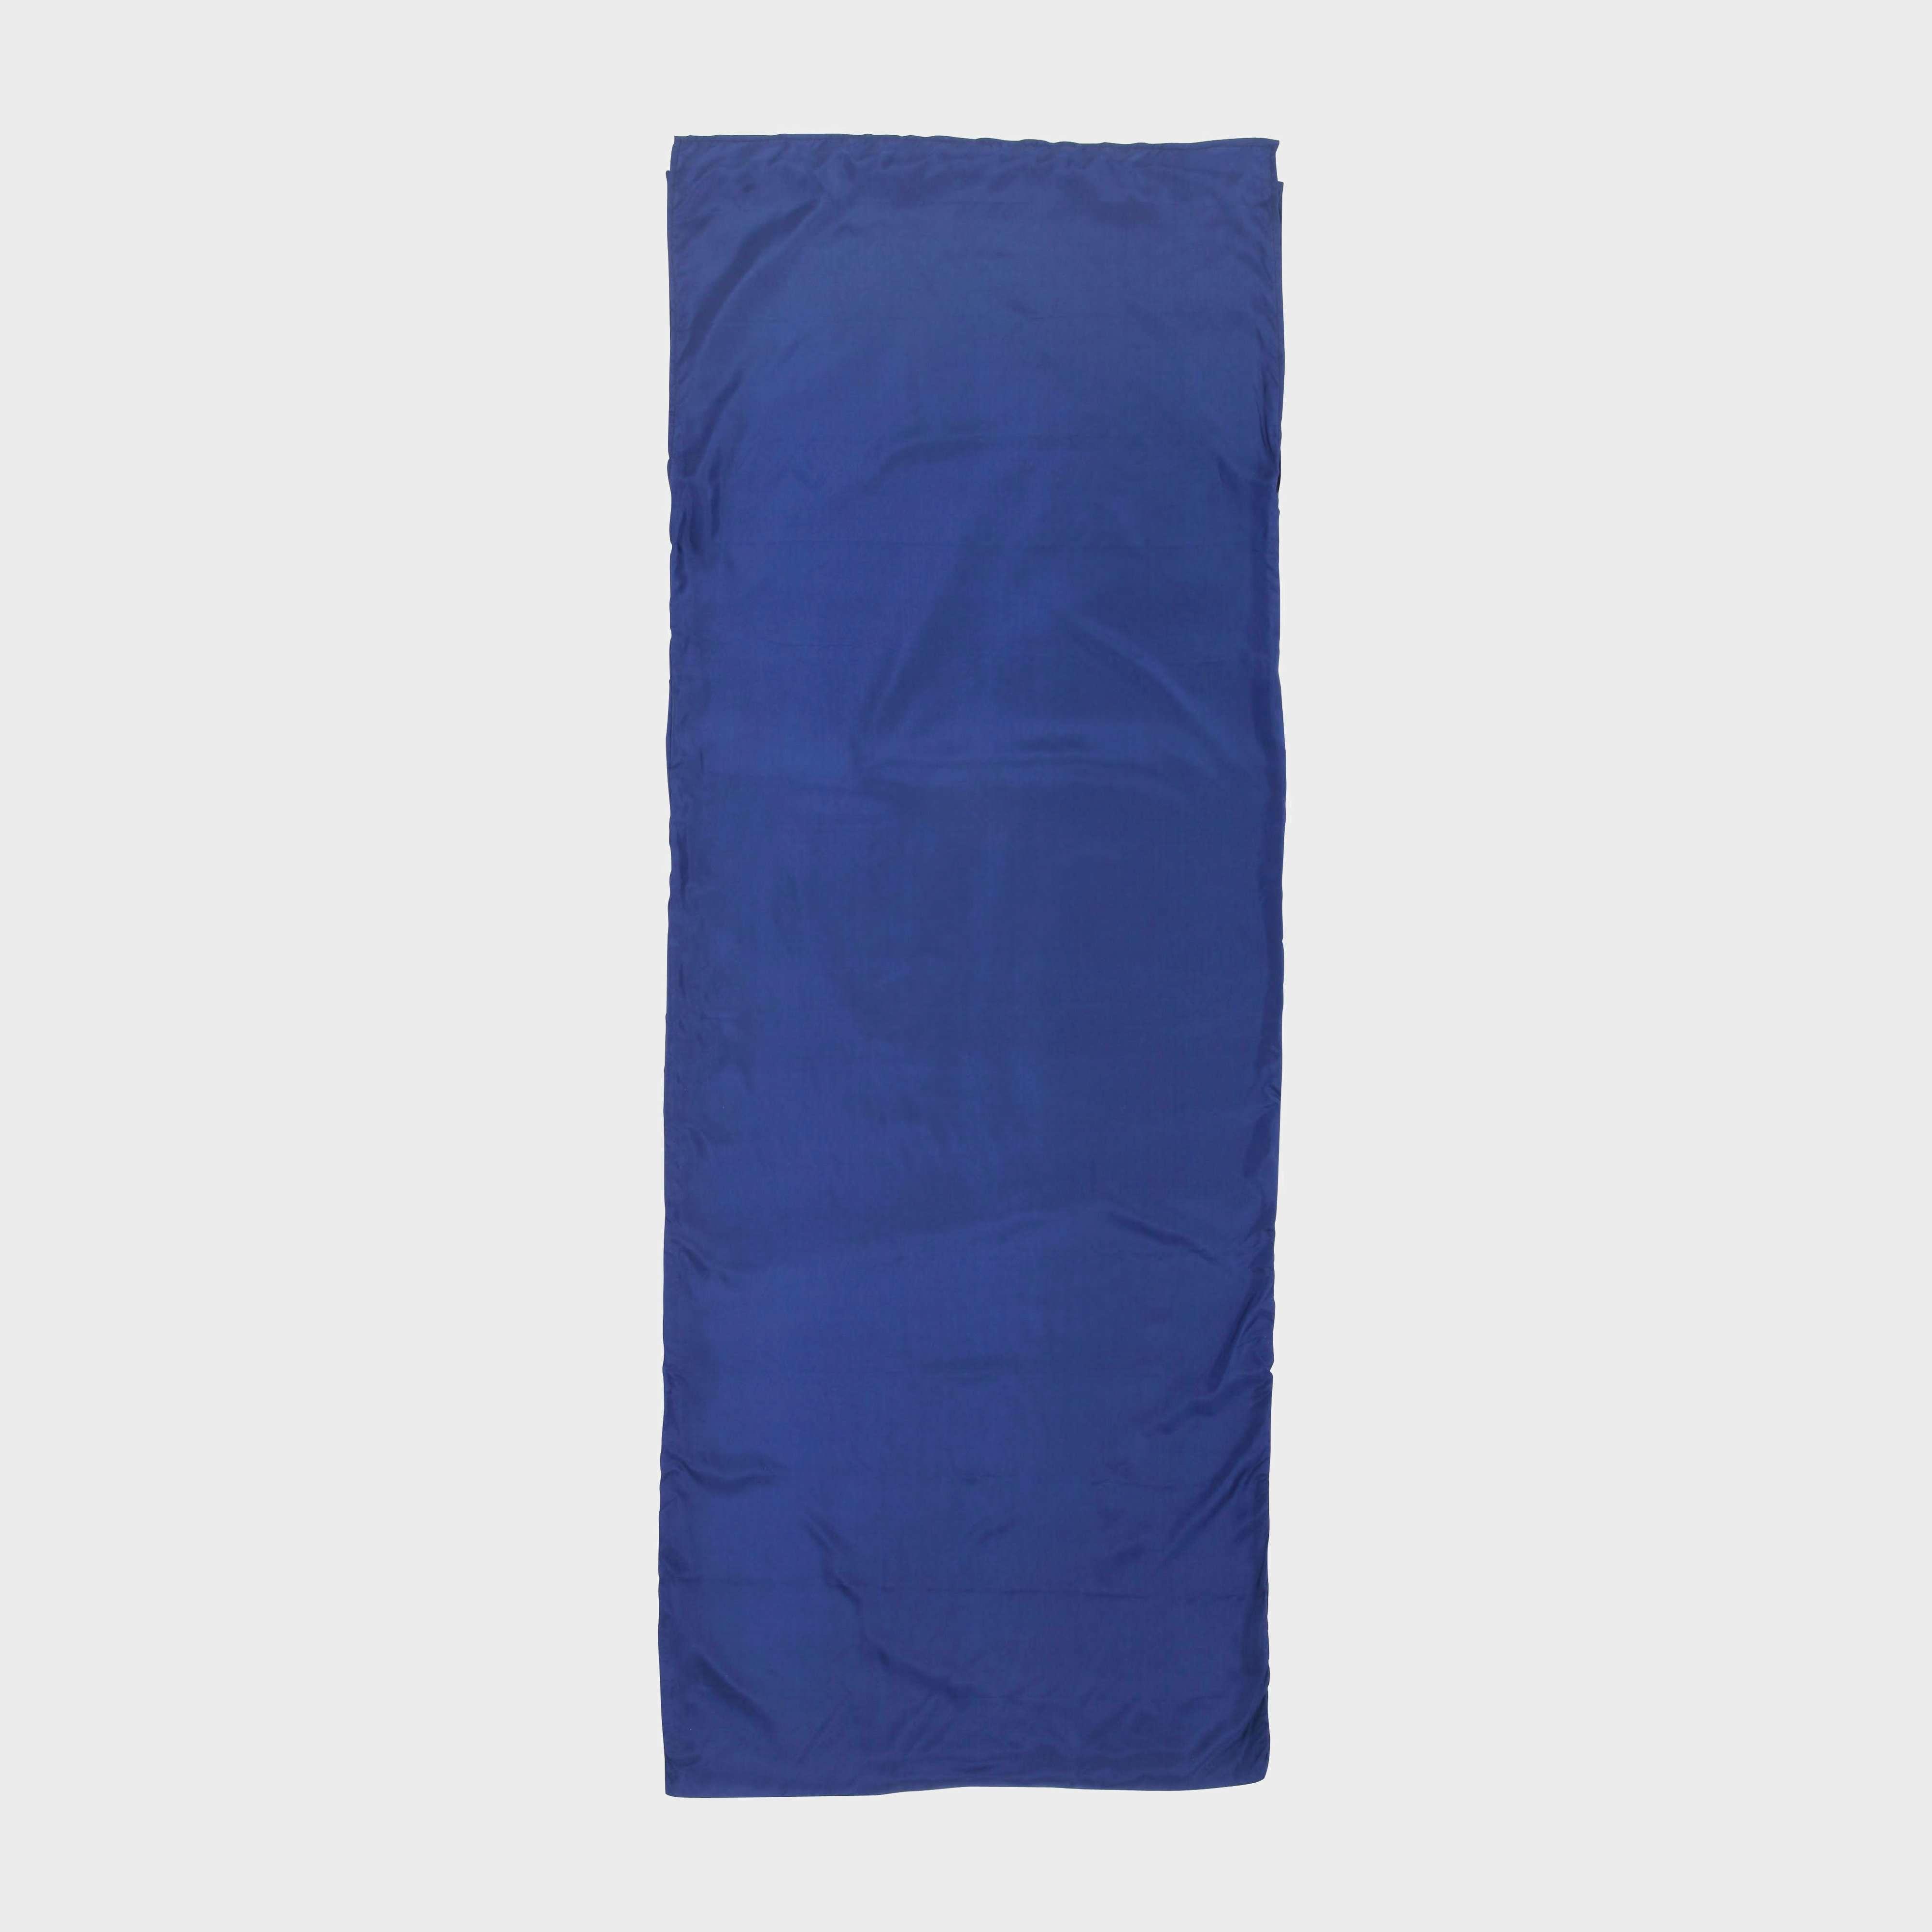 EUROHIKE Silk Rectangle Sleeping Bag Liner